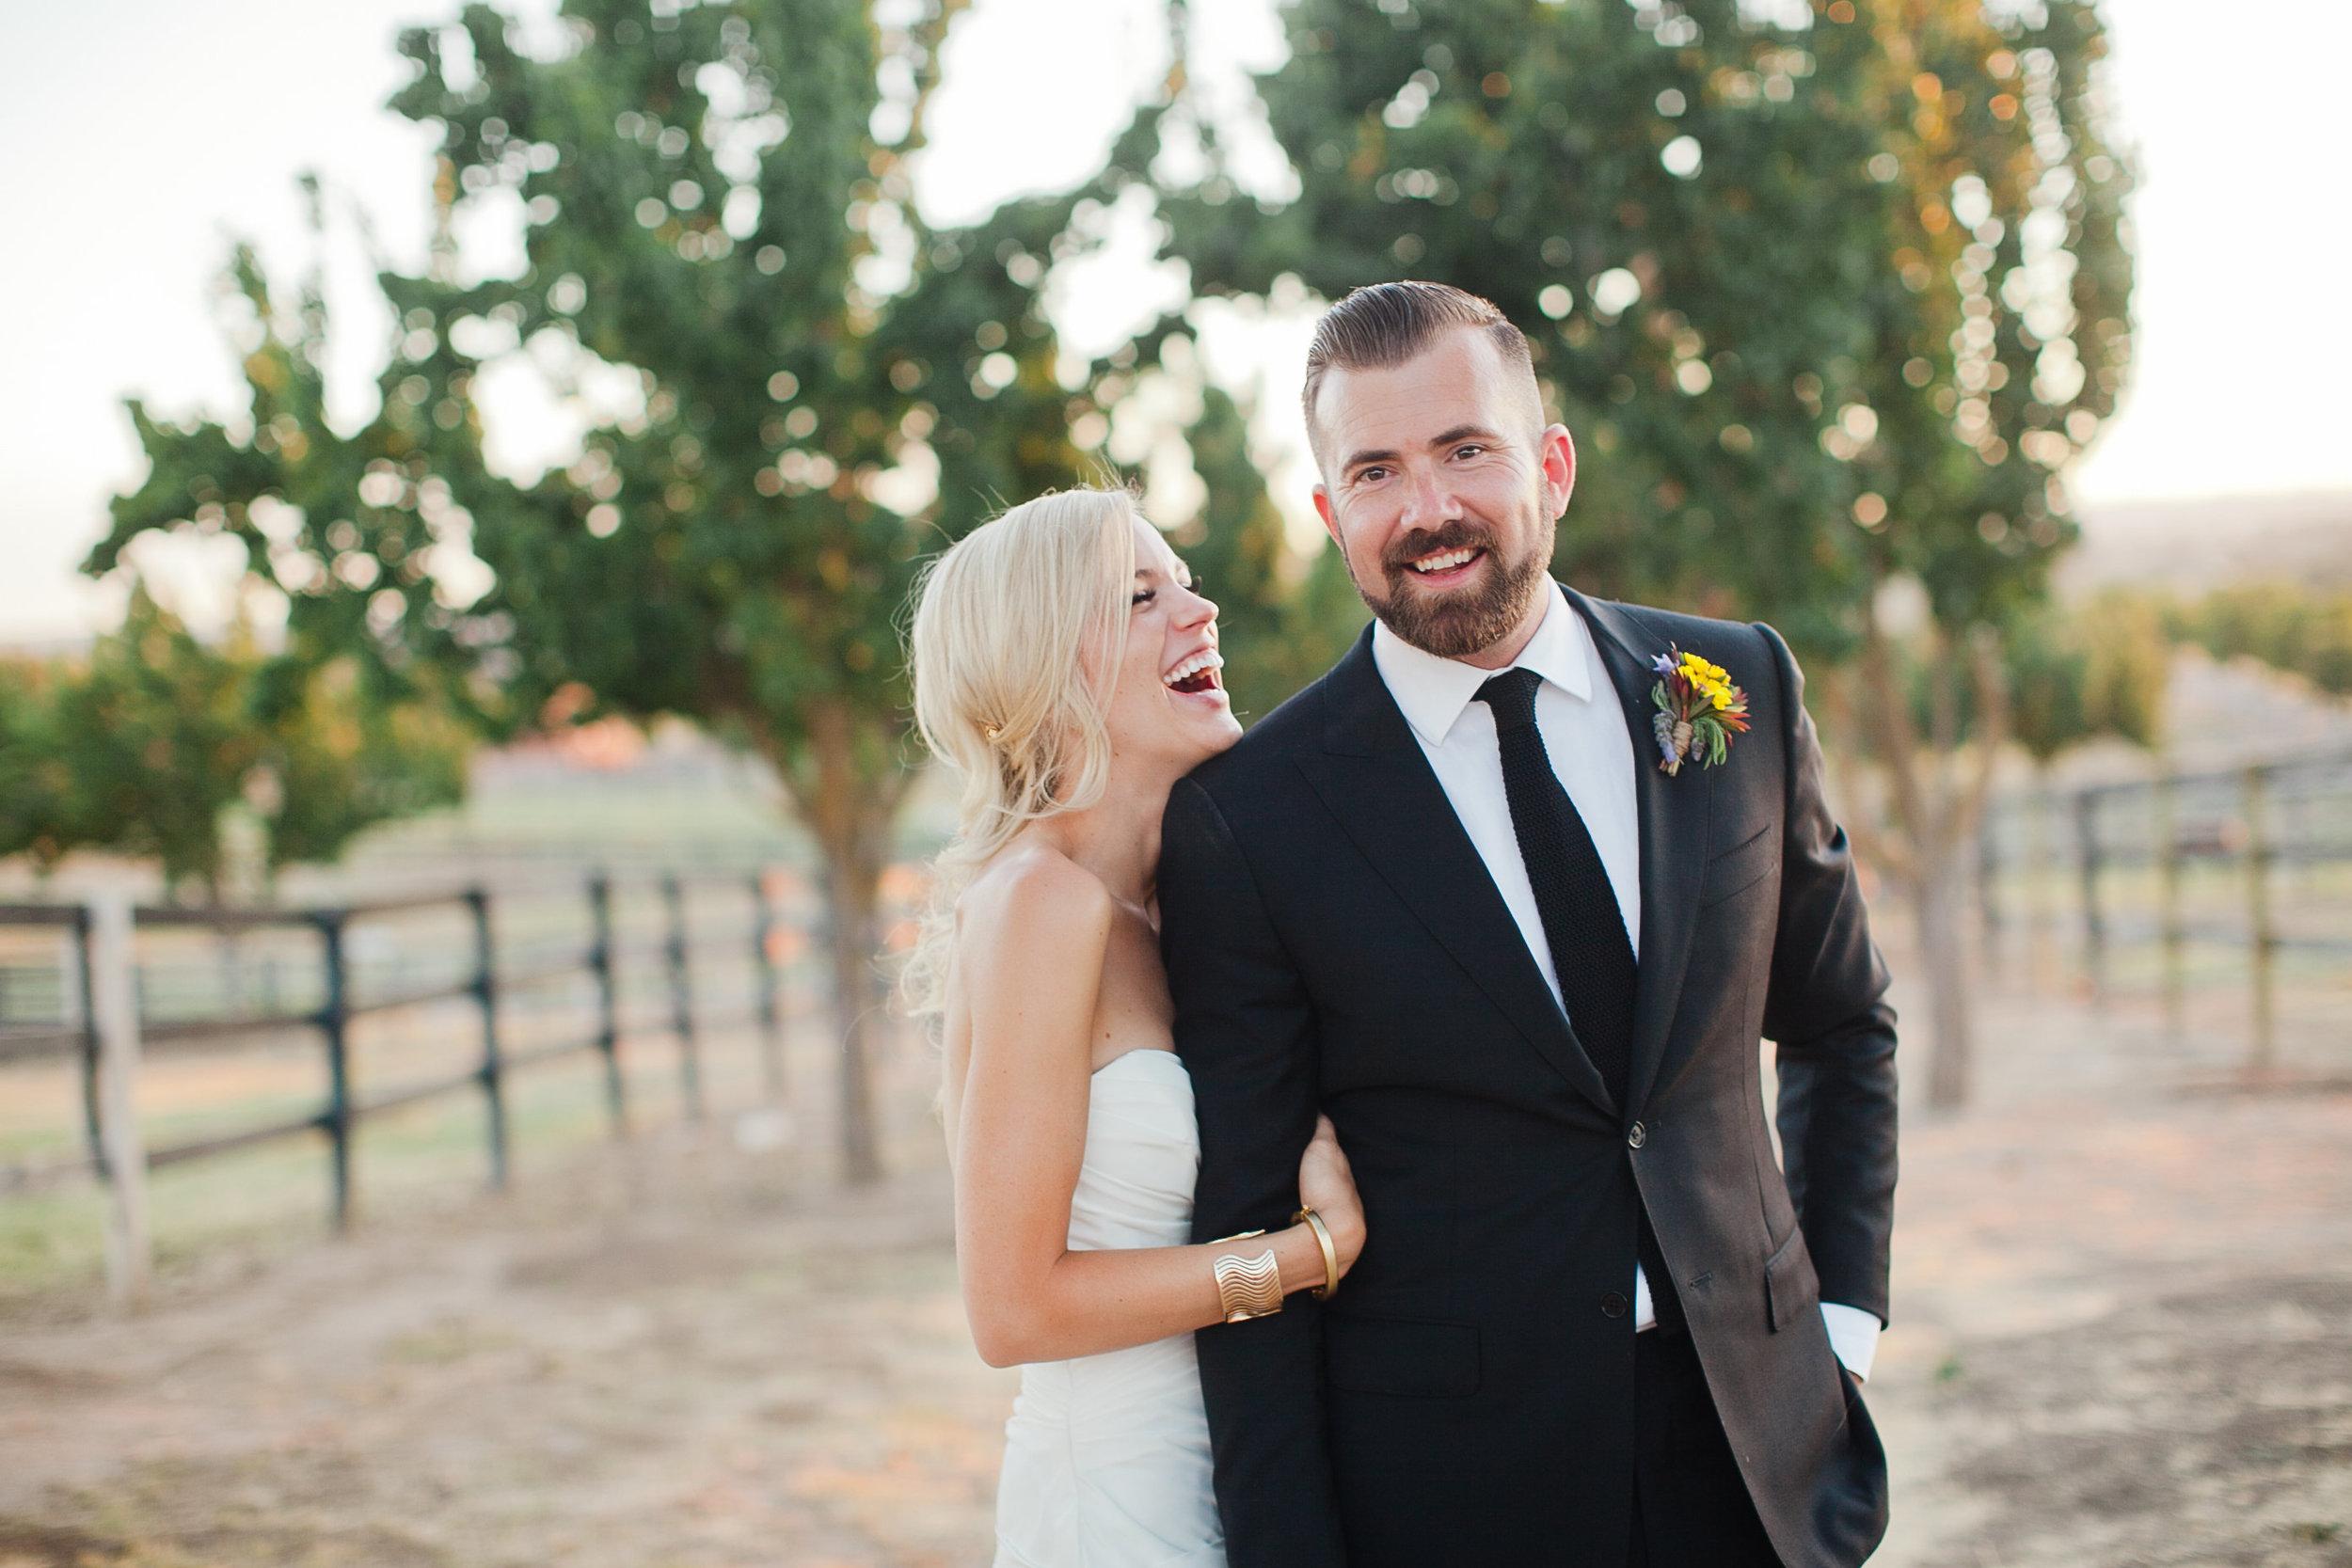 Jillian & Ian | Windfall Farms Wedding